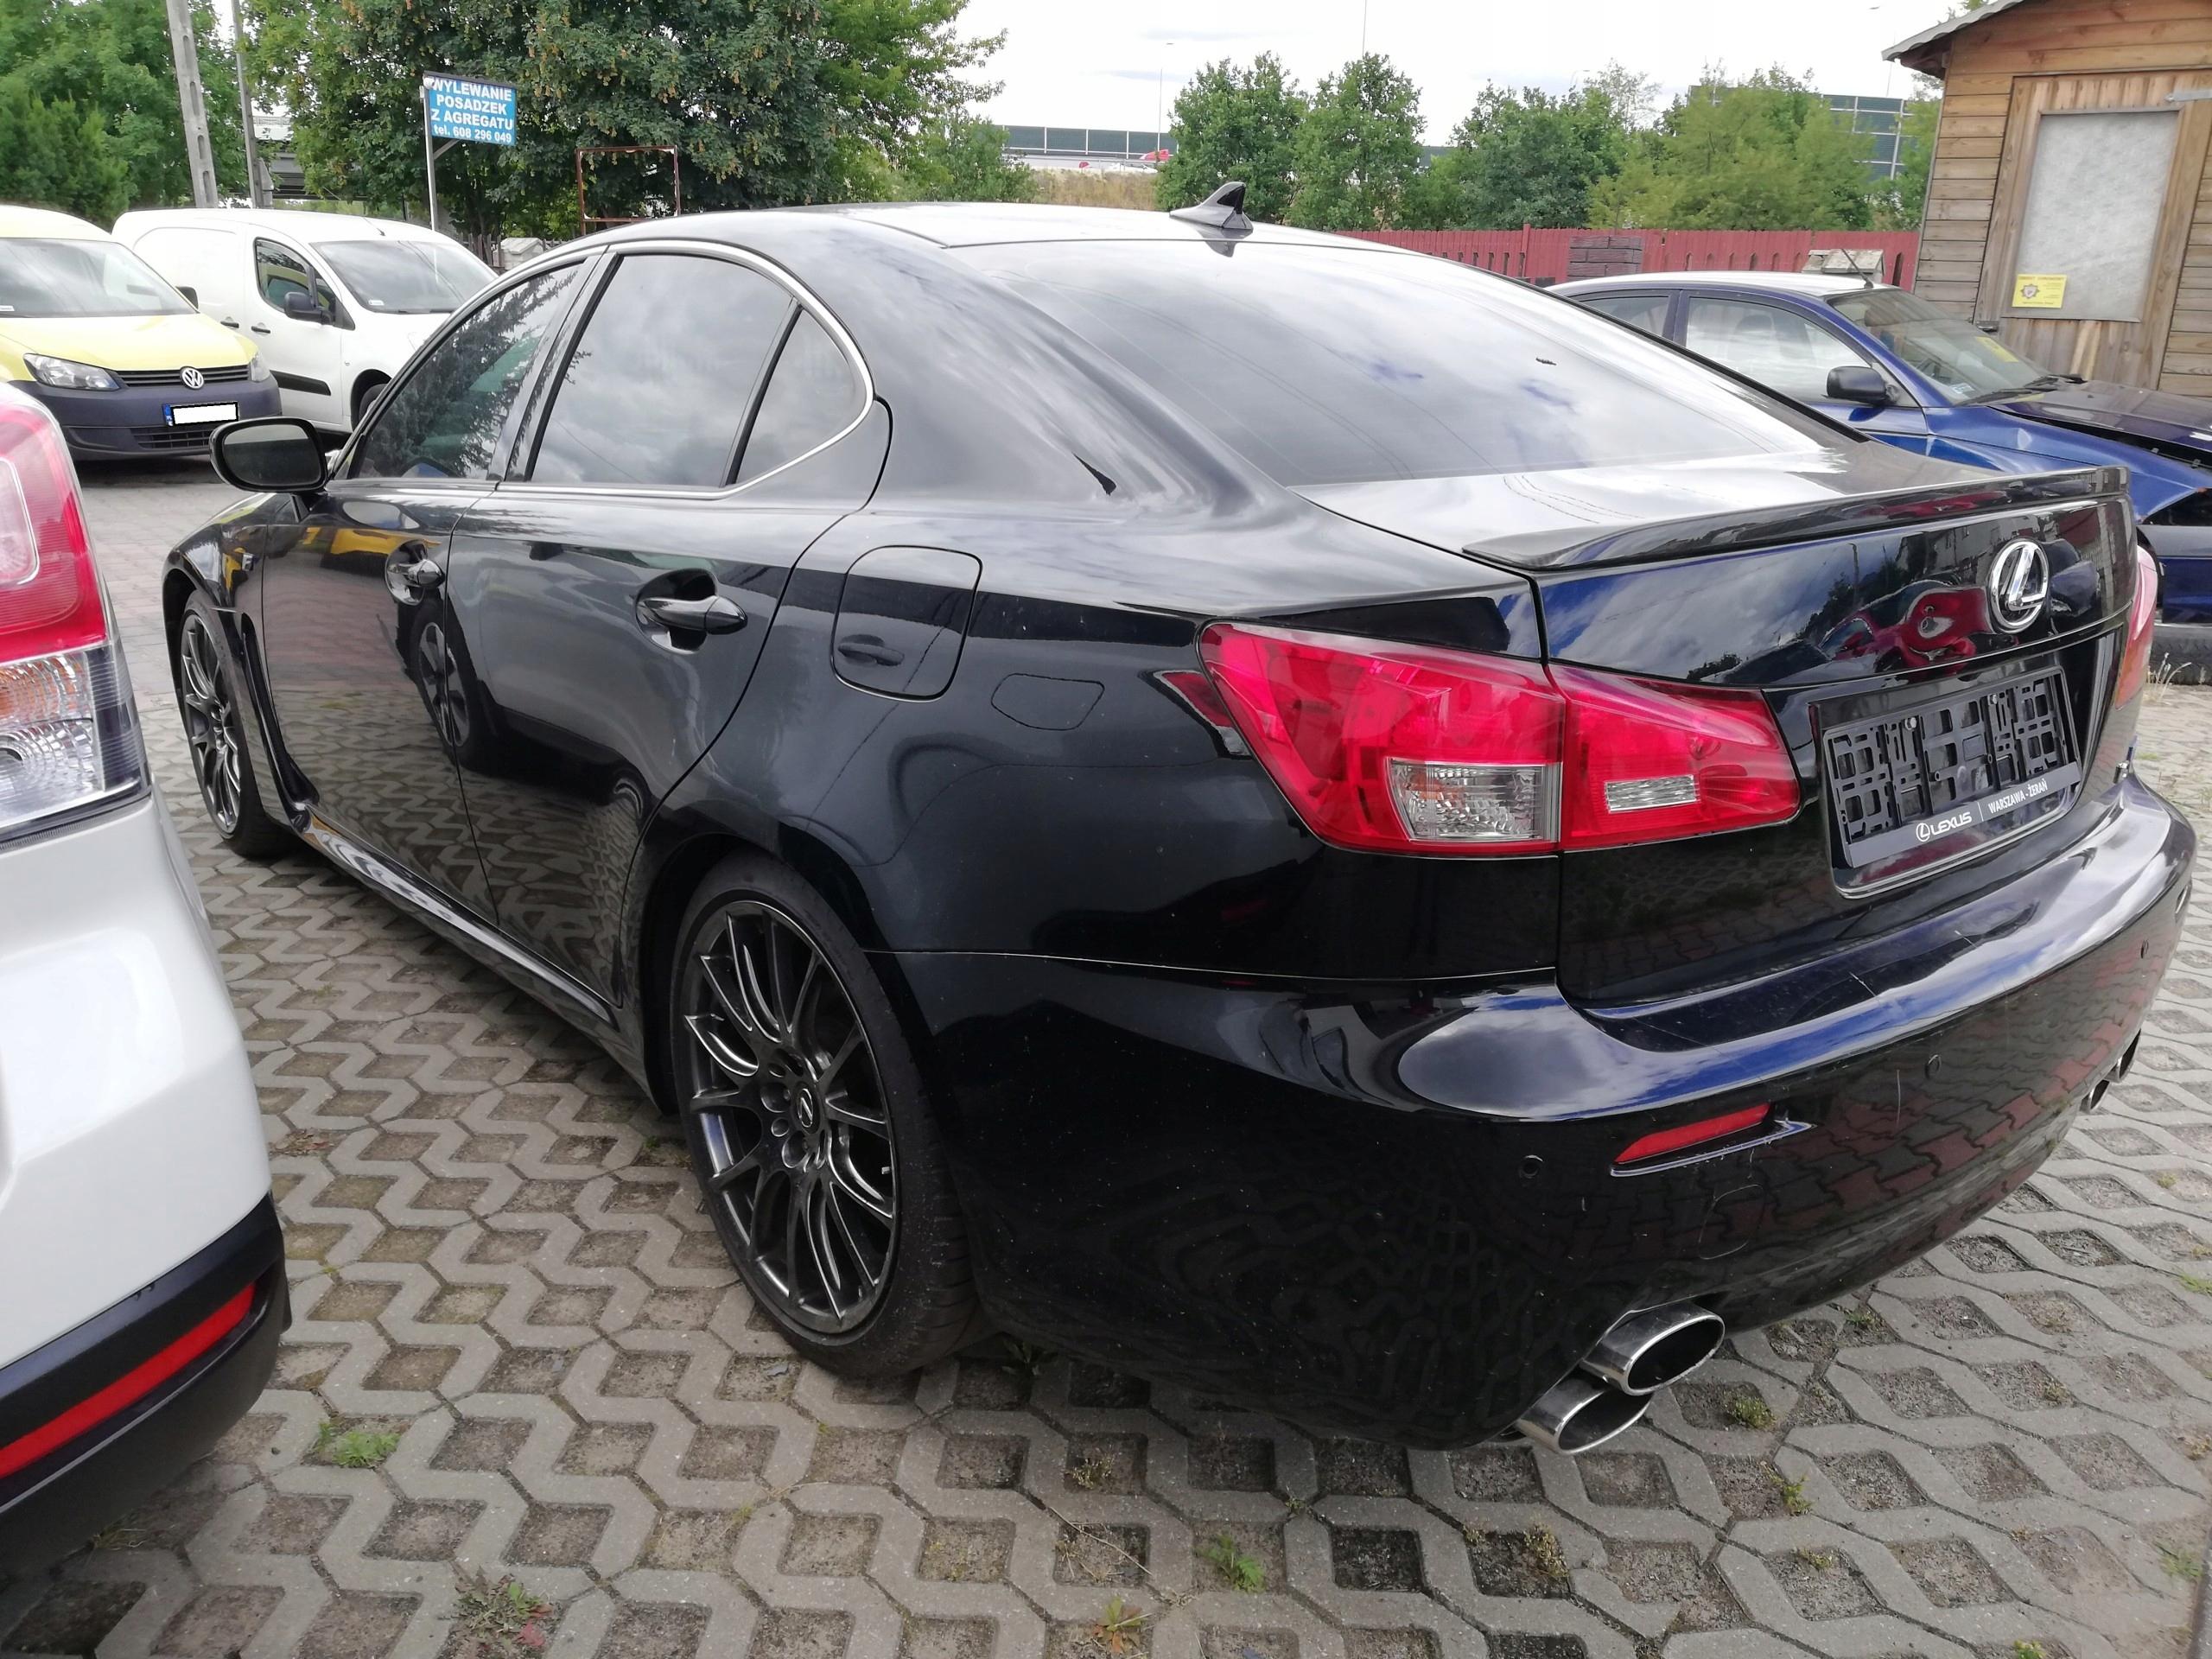 Lexus ISF 5 0 Najbogatsza wersja Sikky Headers - 7432783306